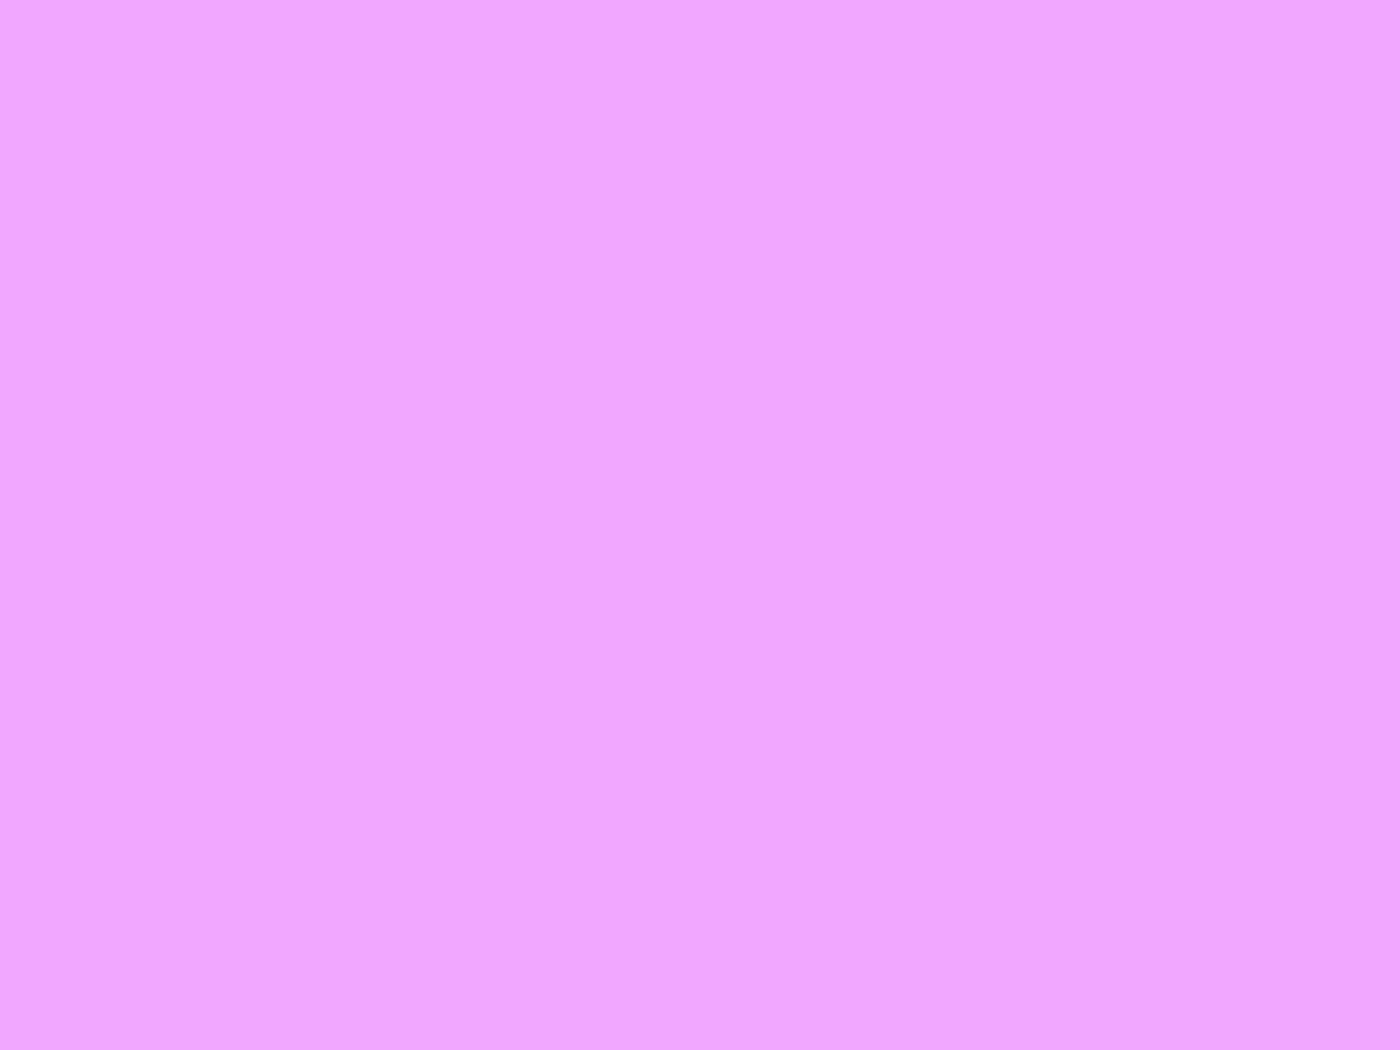 1400x1050 Rich Brilliant Lavender Solid Color Background